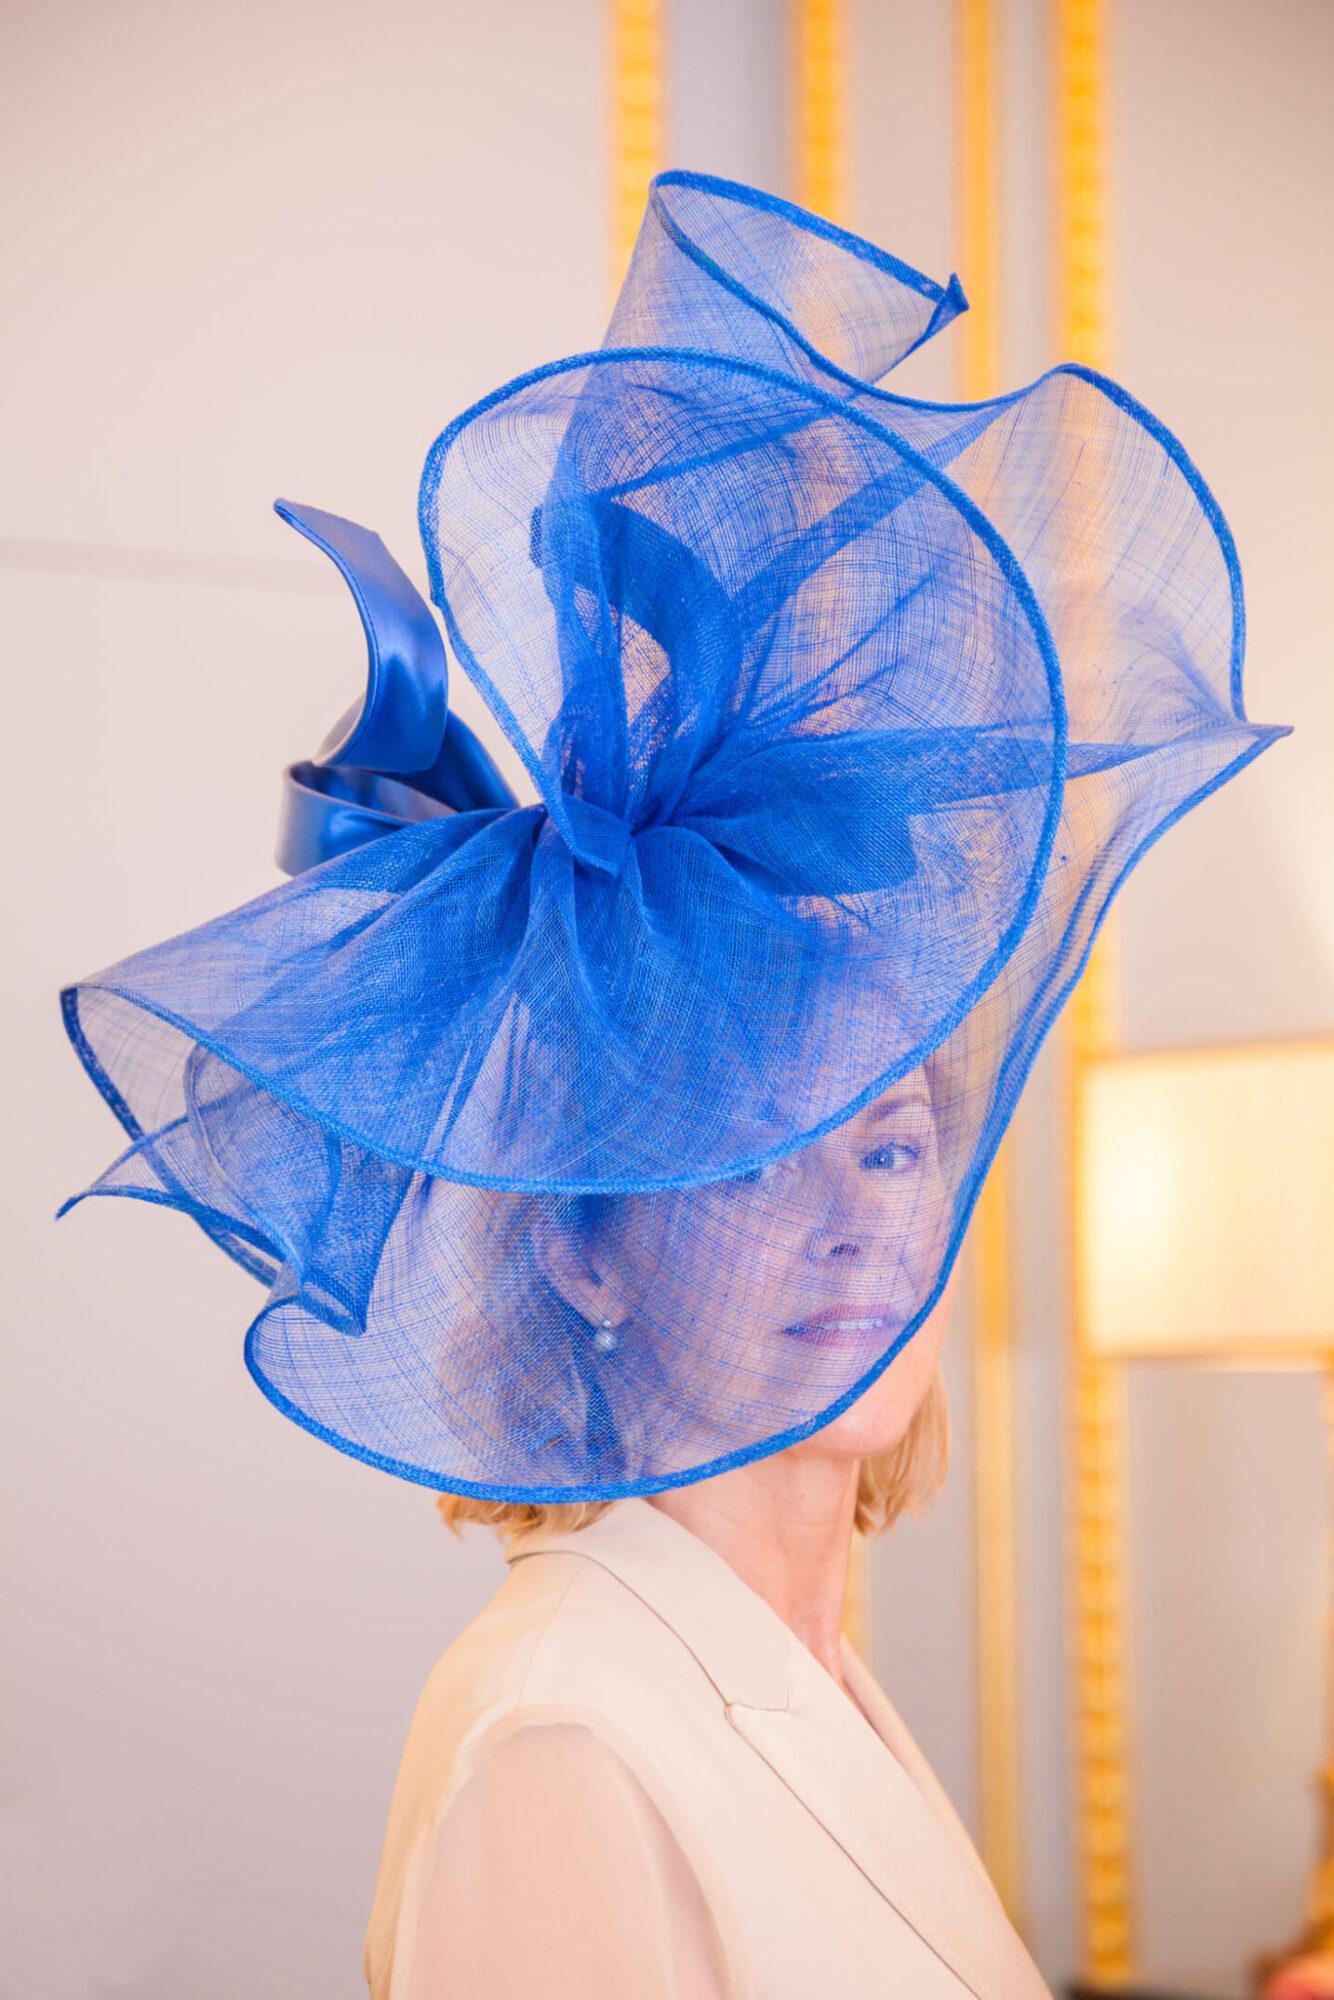 Леди Пенелопа Маунтбаттен (Lady Penelope Mountbatten)